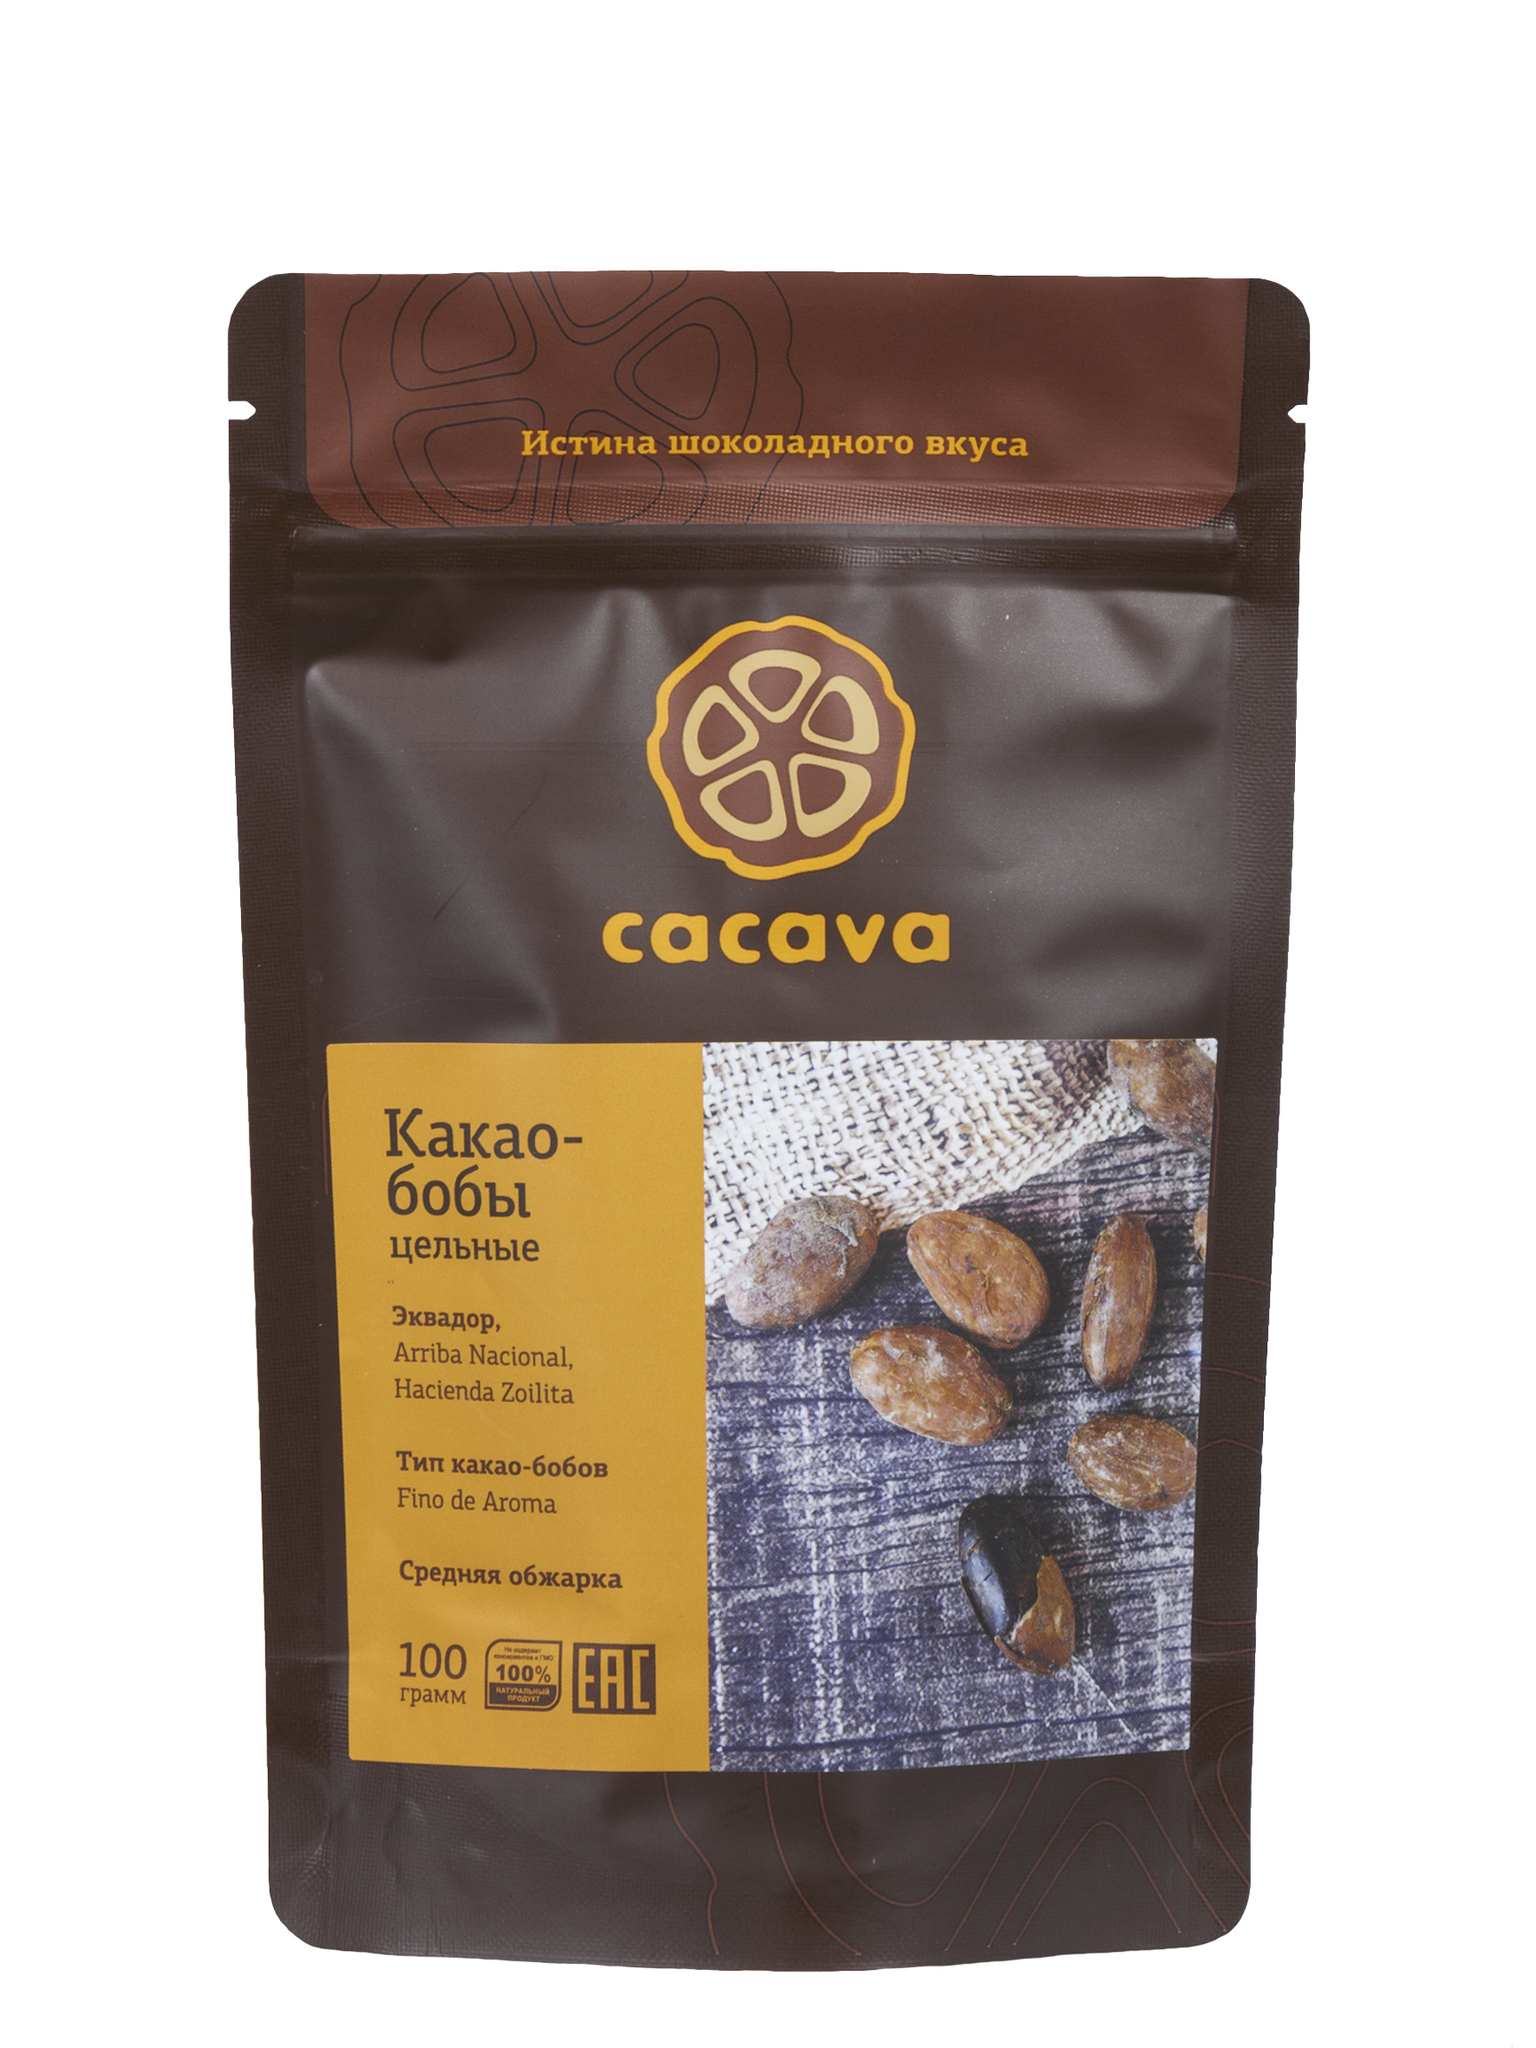 Какао-бобы цельные (Эквадор), упаковка 100 грамм